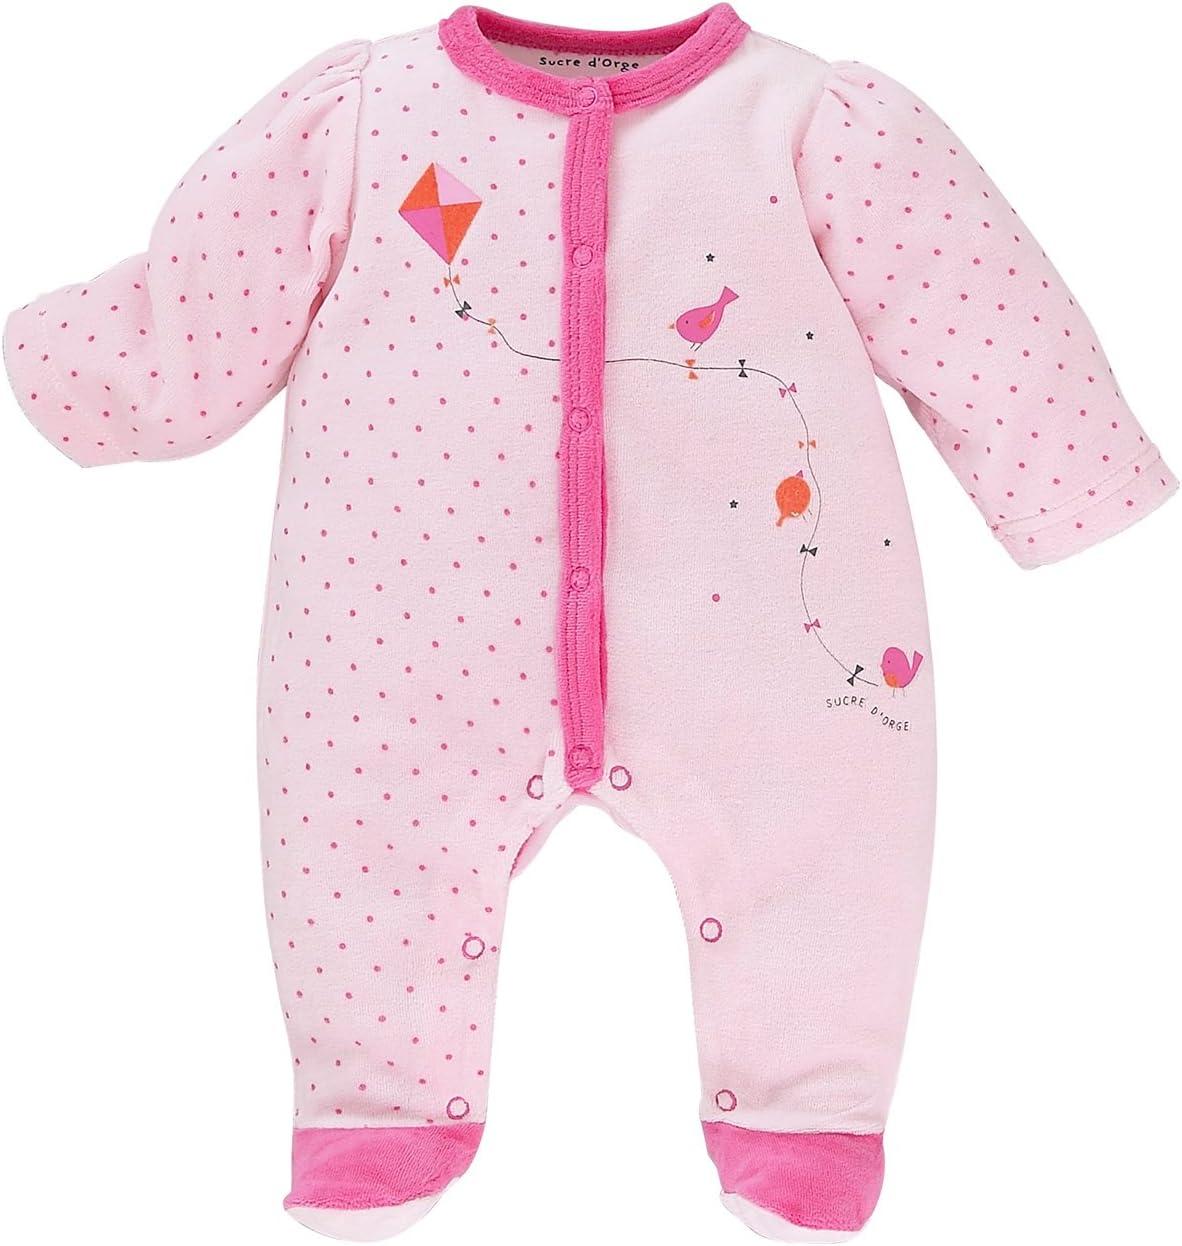 Sucre DOrge-BabyProducts-Feminin-Pijama para bebé, color ...